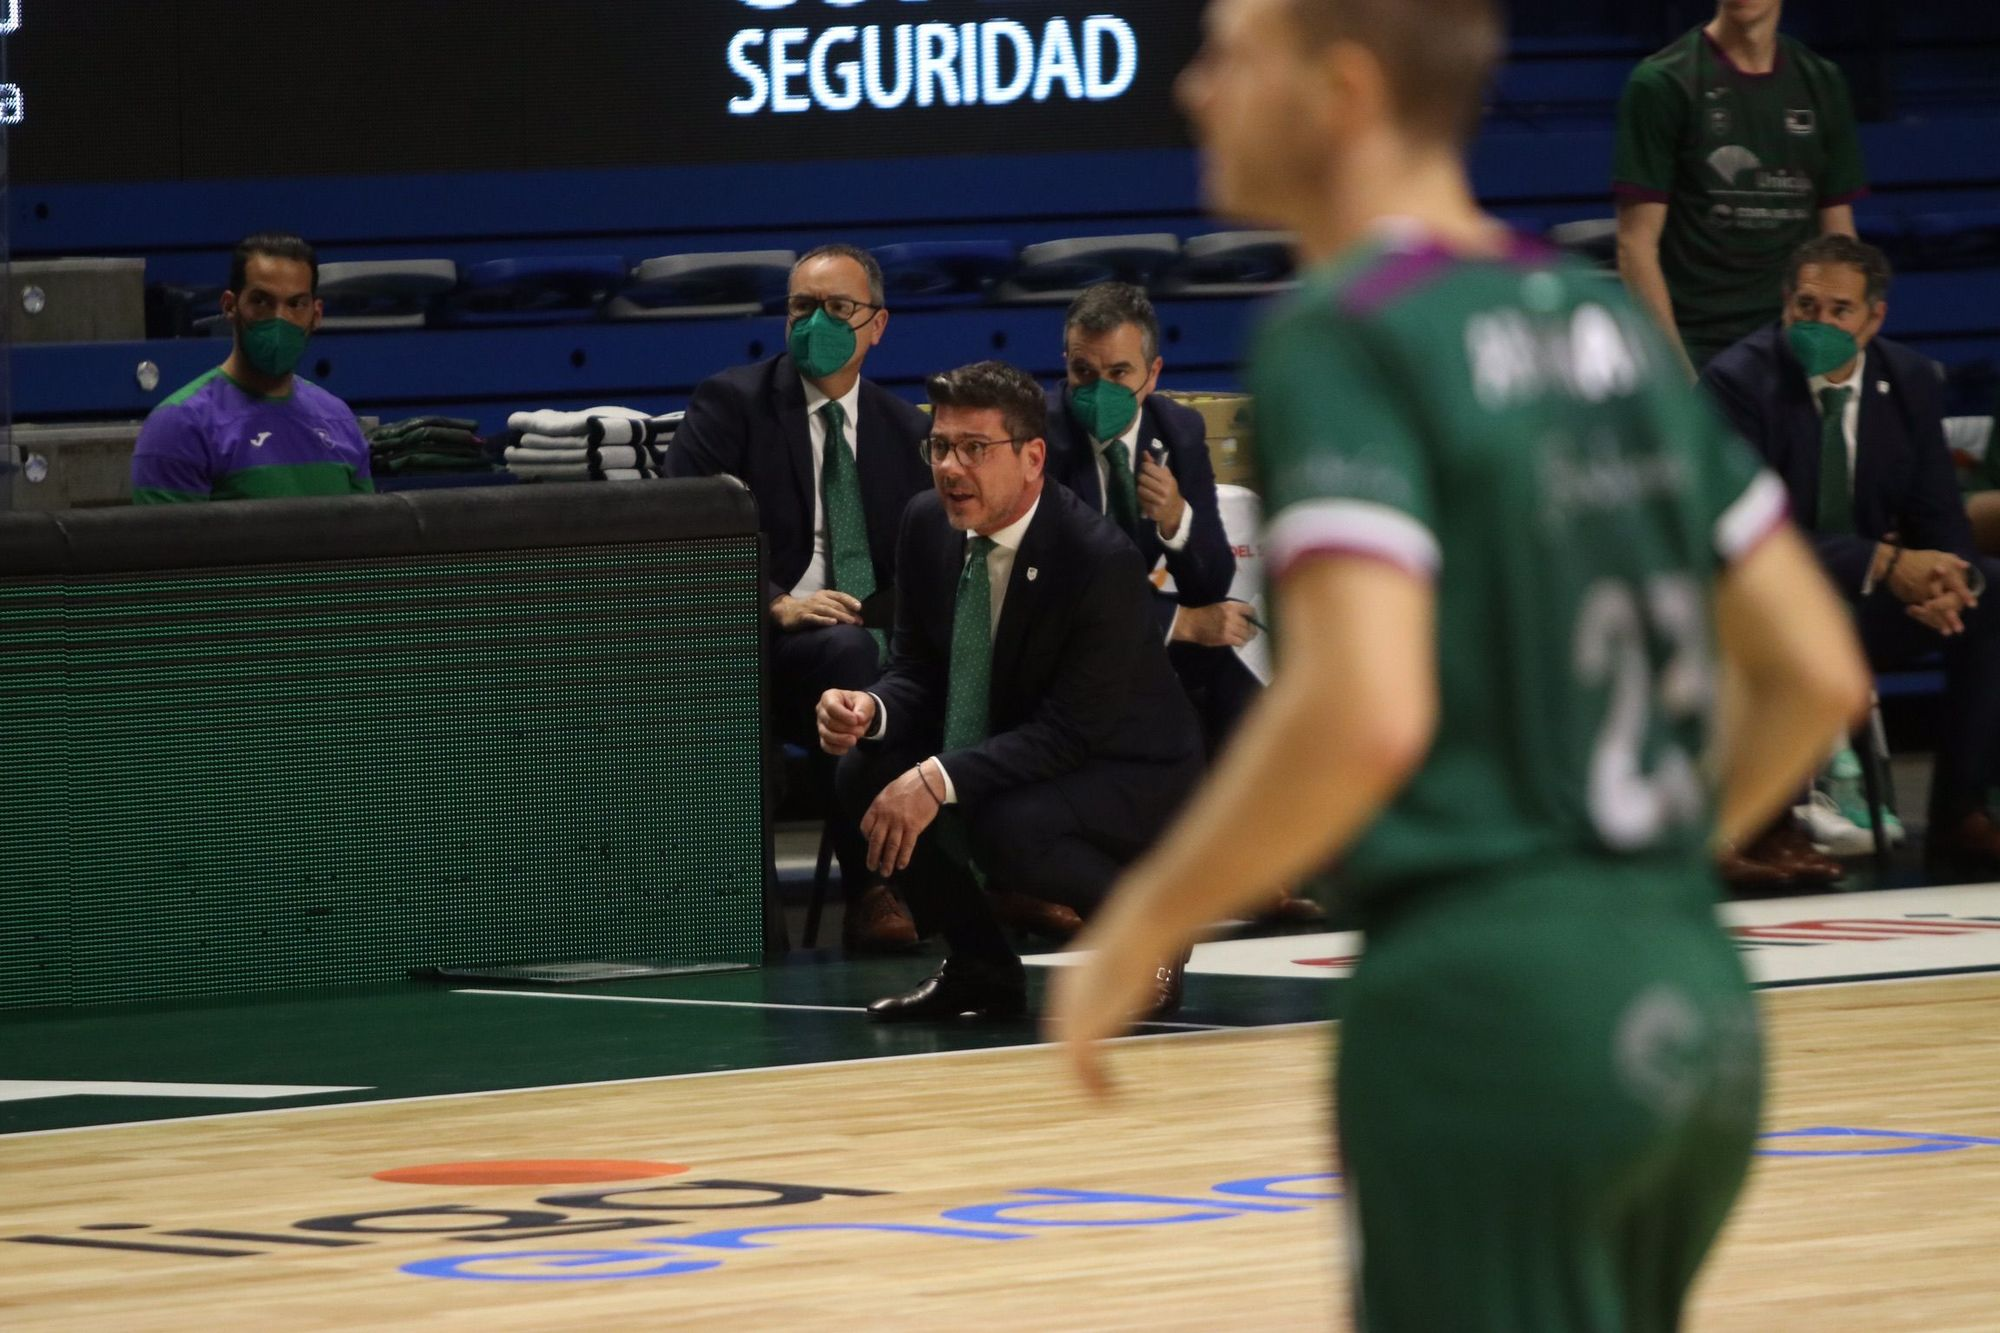 Liga Endesa: Unicaja CB - Morabanc Andorra